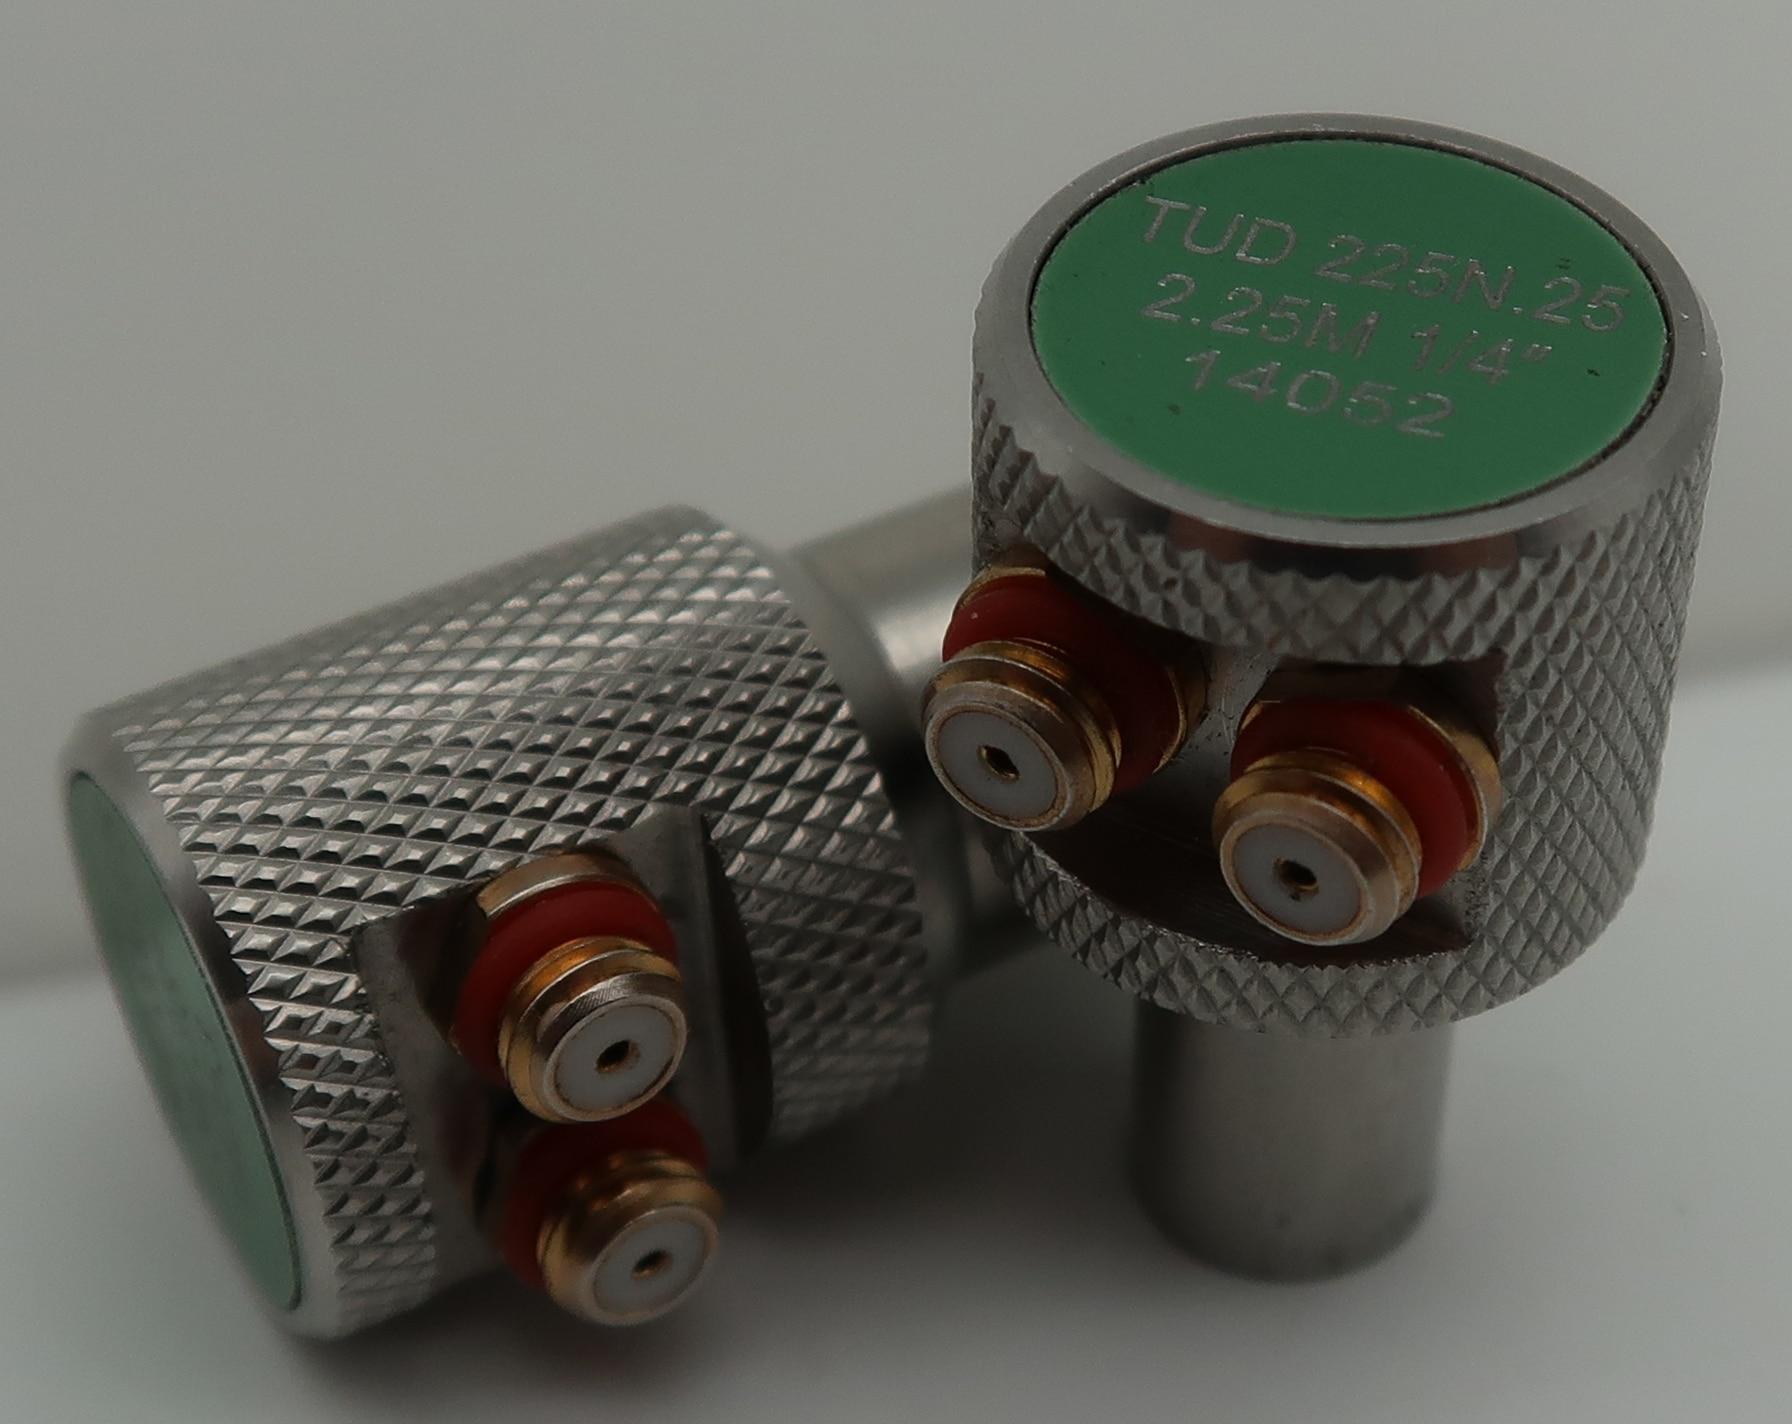 TUD5N.5 مسبار اتصال مزدوج 5 ميجاهرتز 1/2 بوصة عمق التركيز 0.5 بوصة